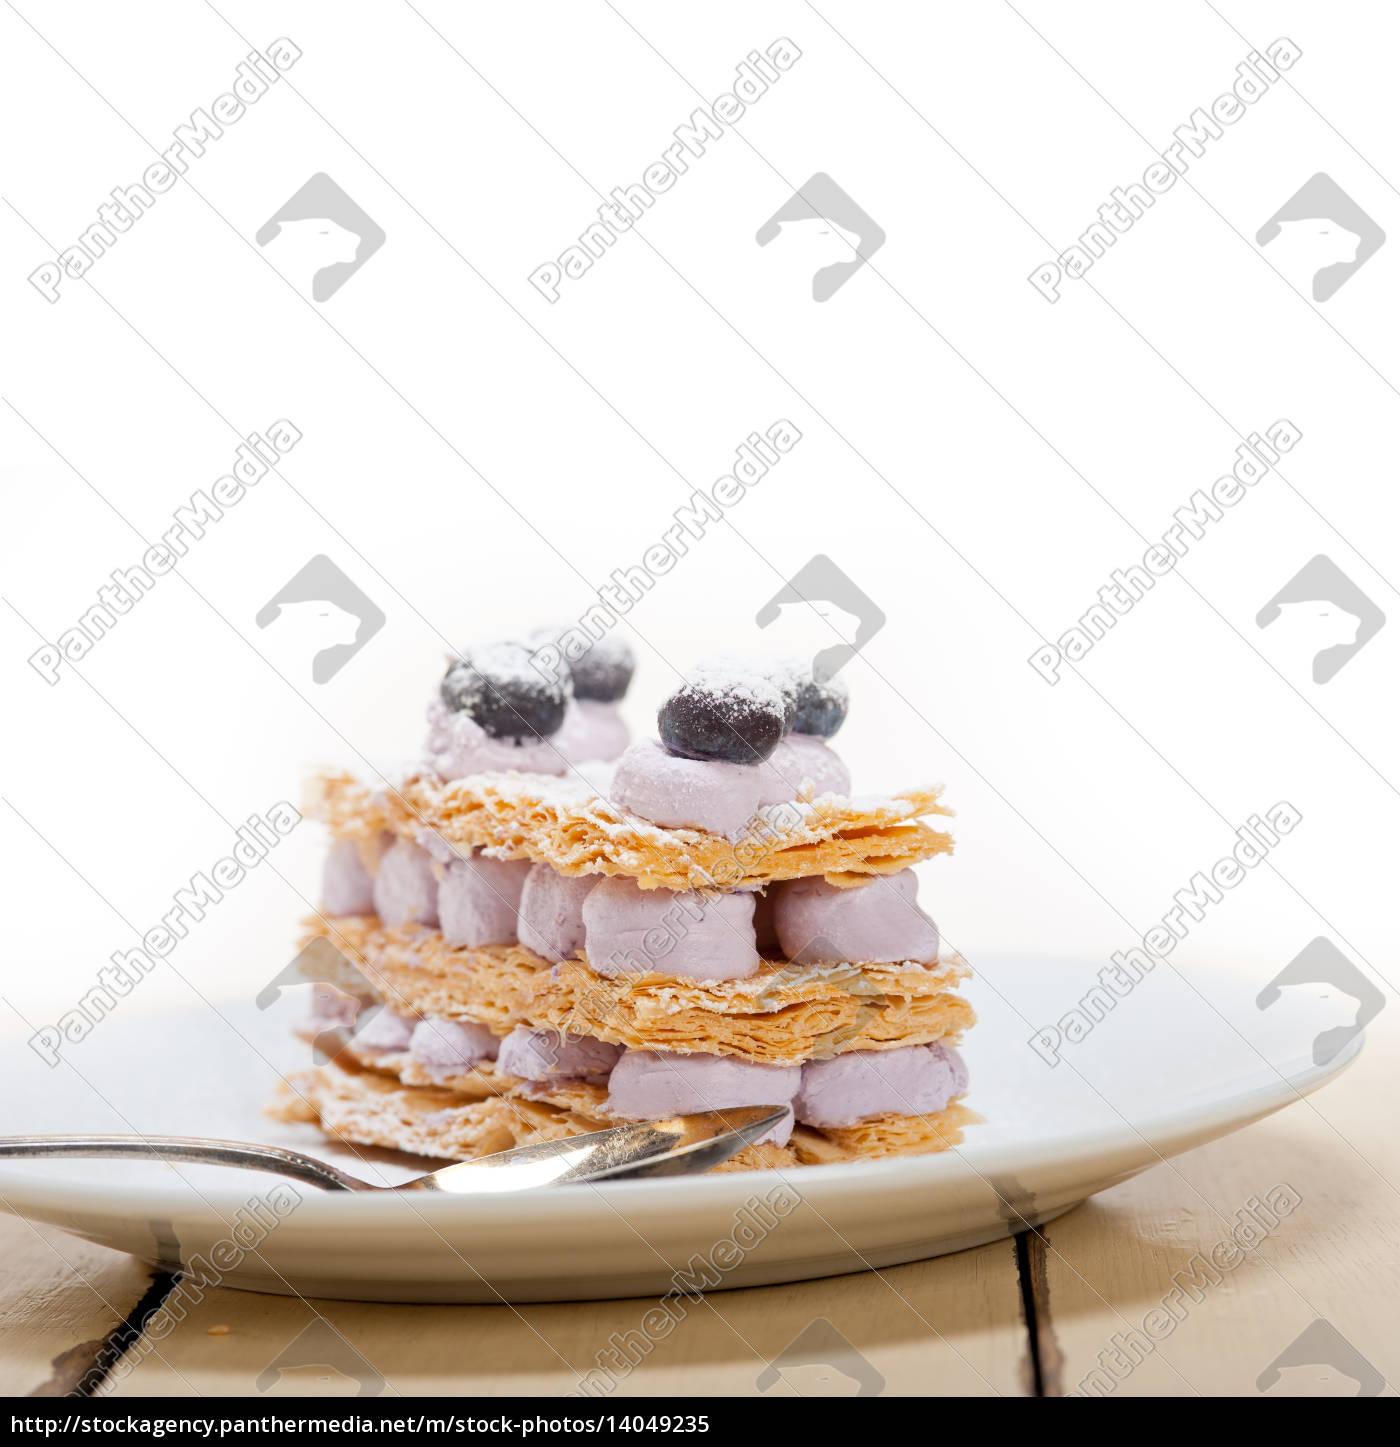 napoleon, blueberry, cake, dessert - 14049235